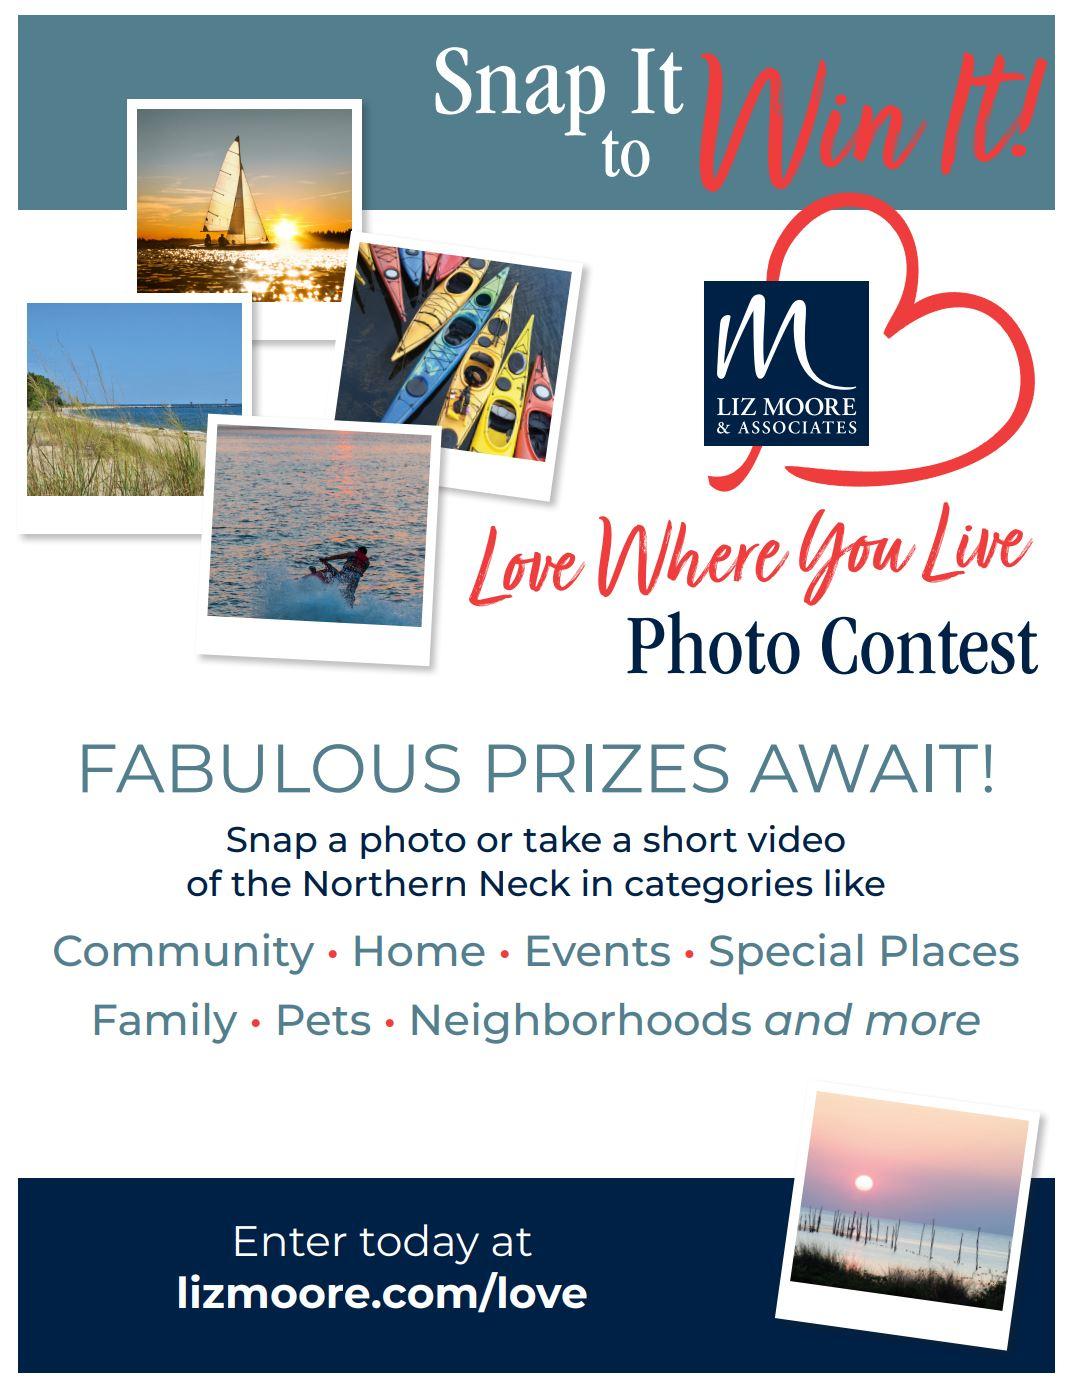 Northern Neck Photo Contest